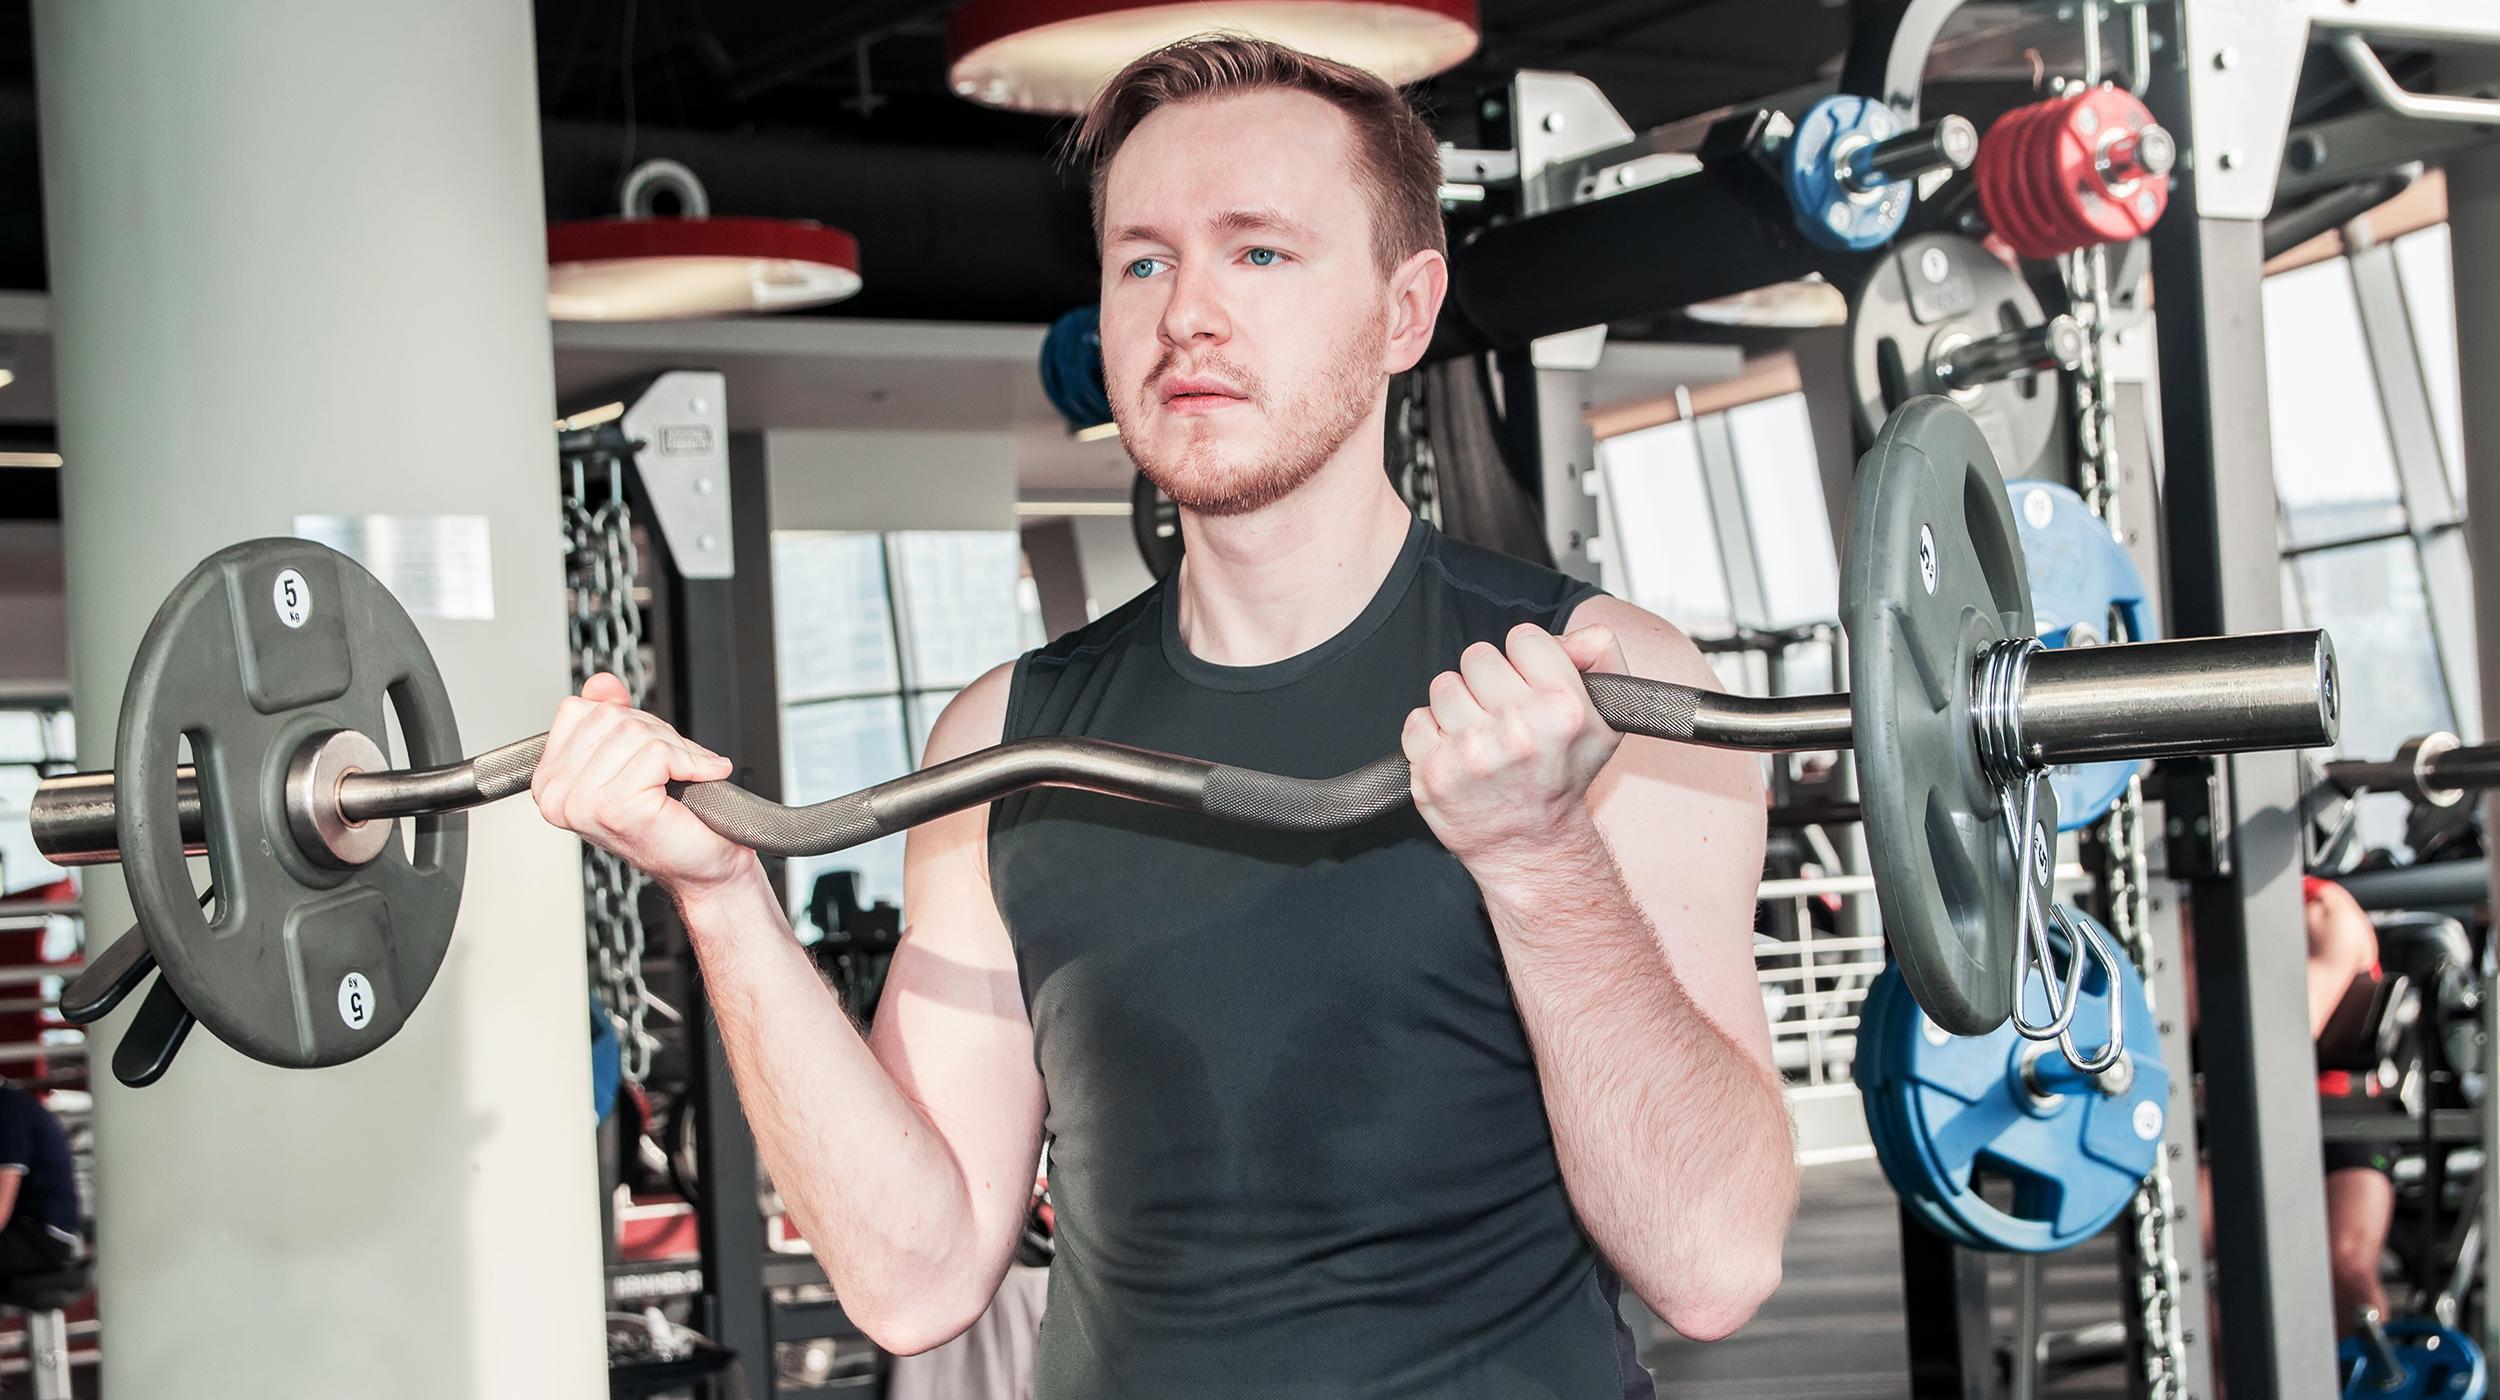 Should I go to the Gym Twice a Day if I am Skinny?